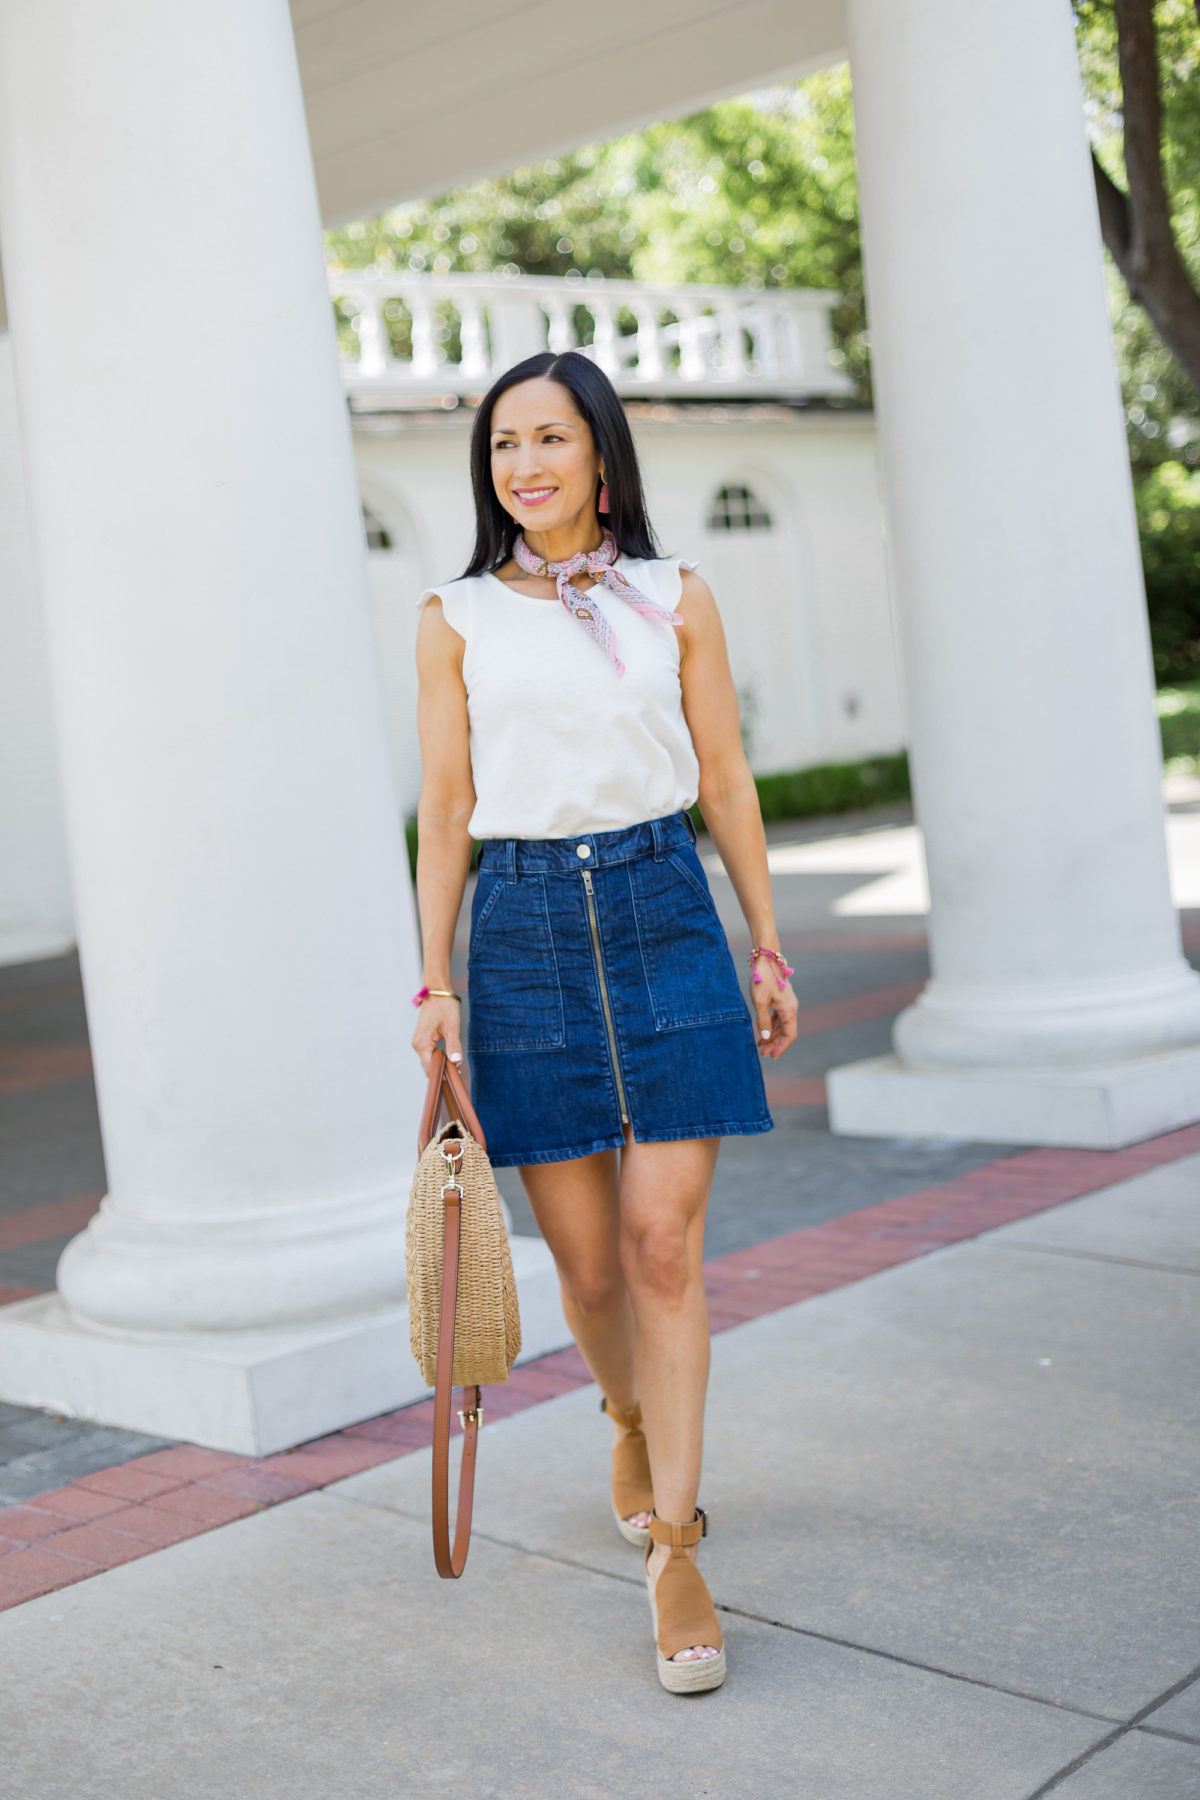 The Denim Skirt You'll Want This Season!